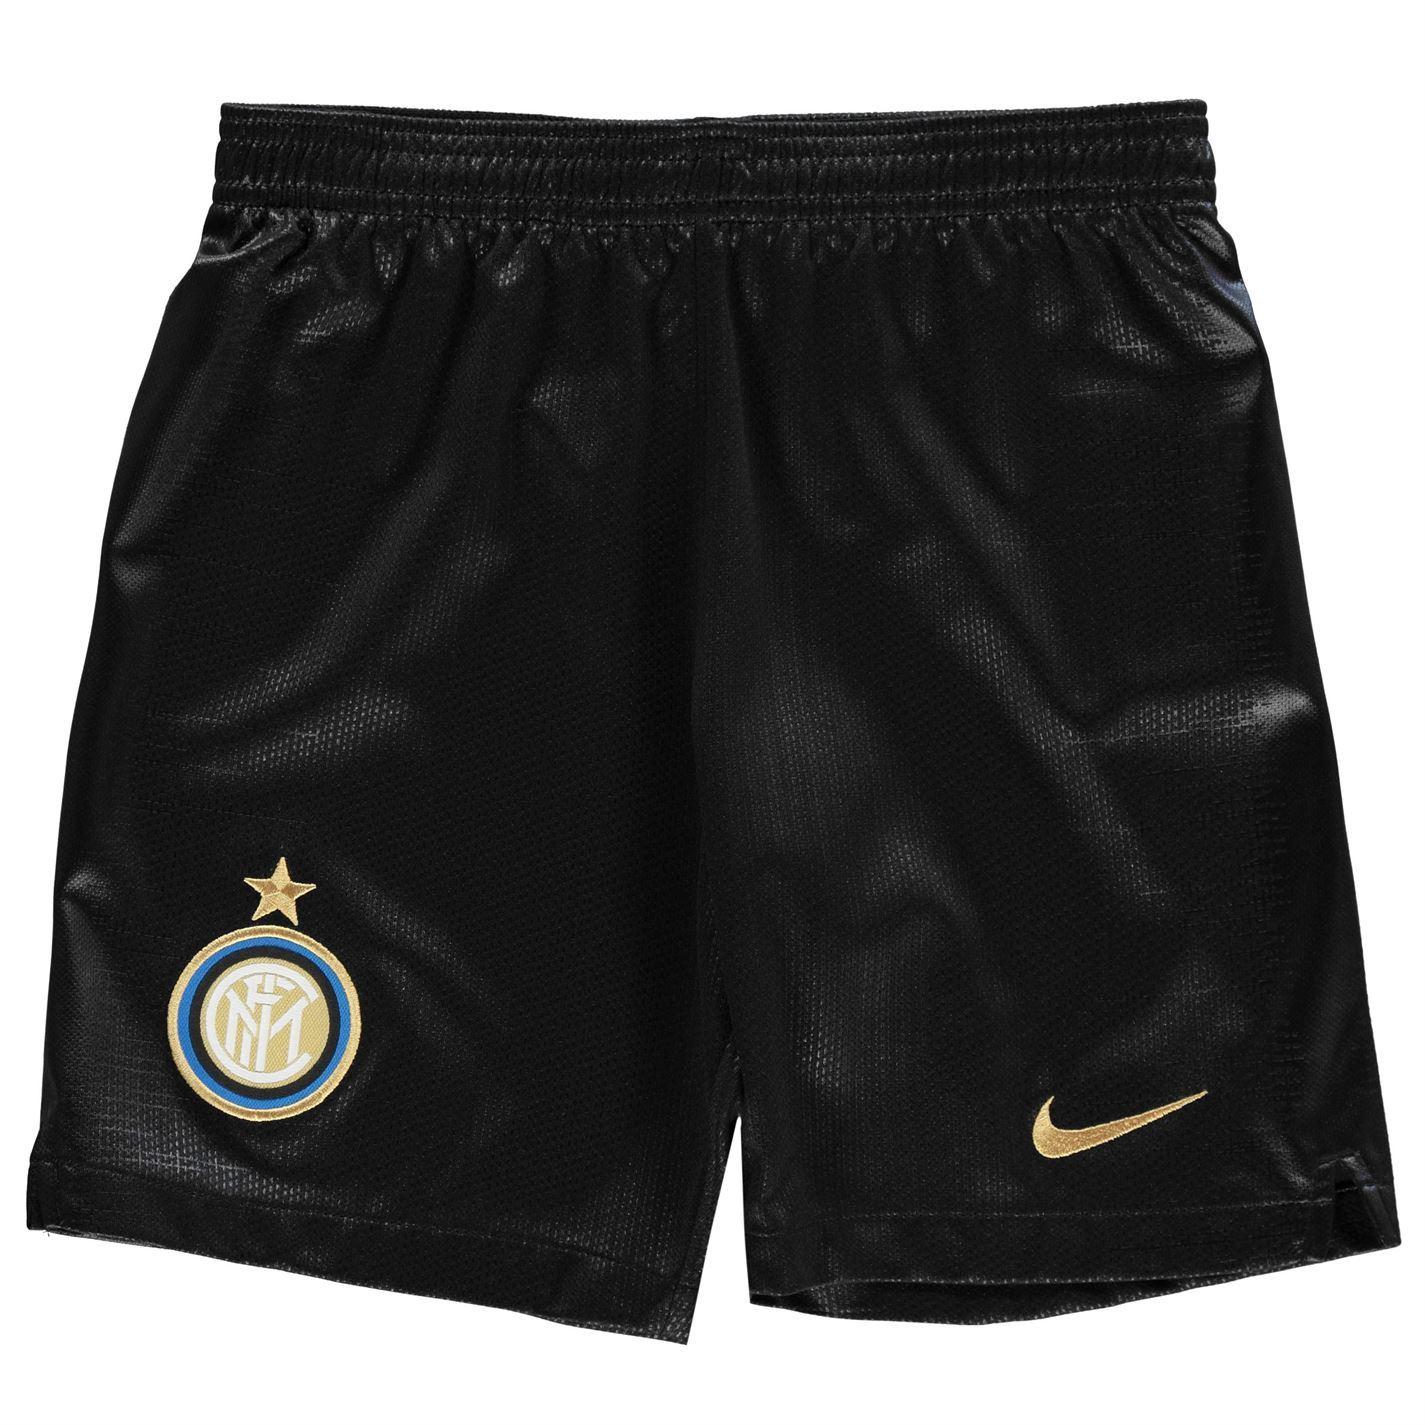 bc820d54b09f ... Nike Inter Milan Home Shorts 2018 2019 Juniors Black Football Soccer  Sportswear ...